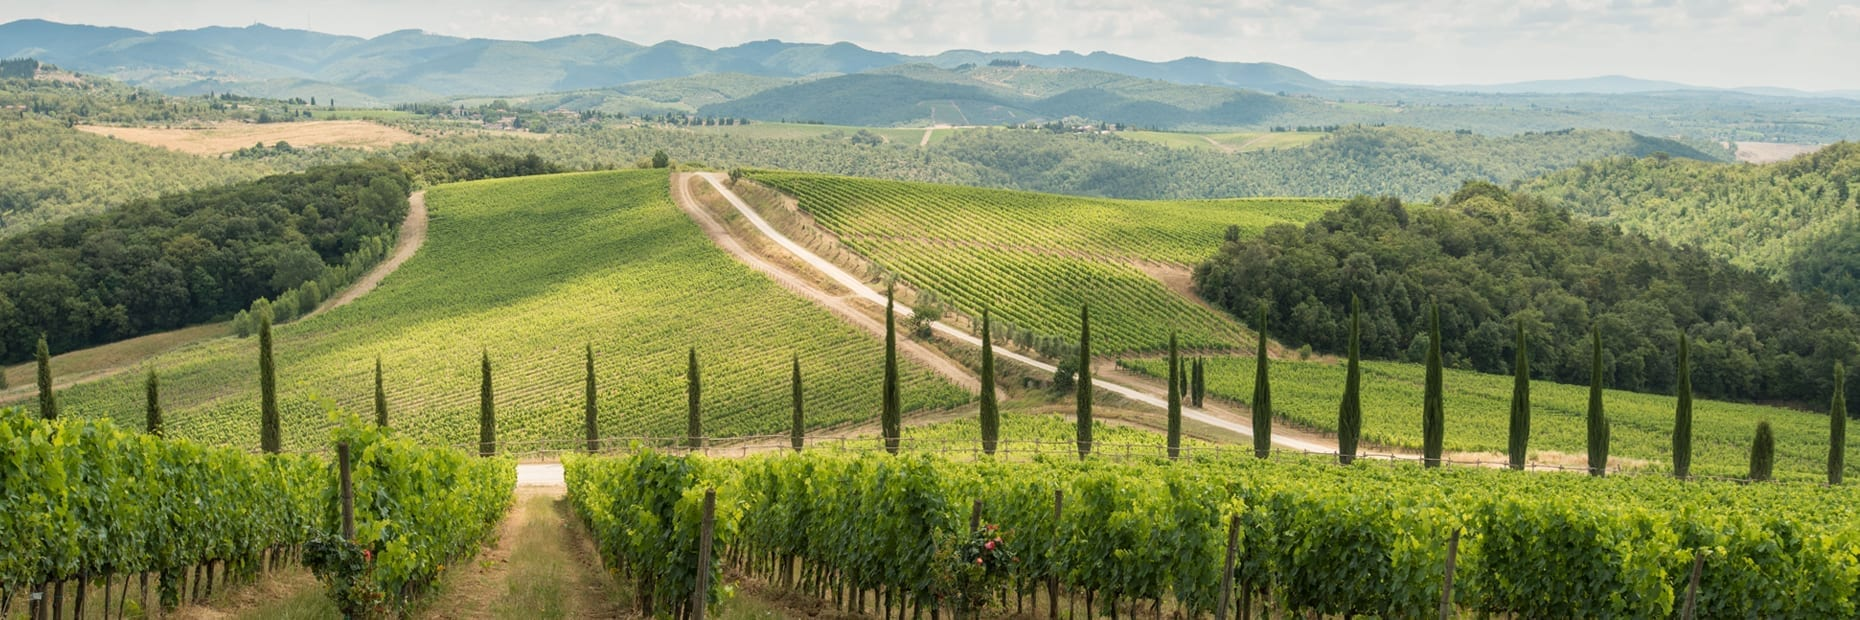 Vineyards Chianti Classico